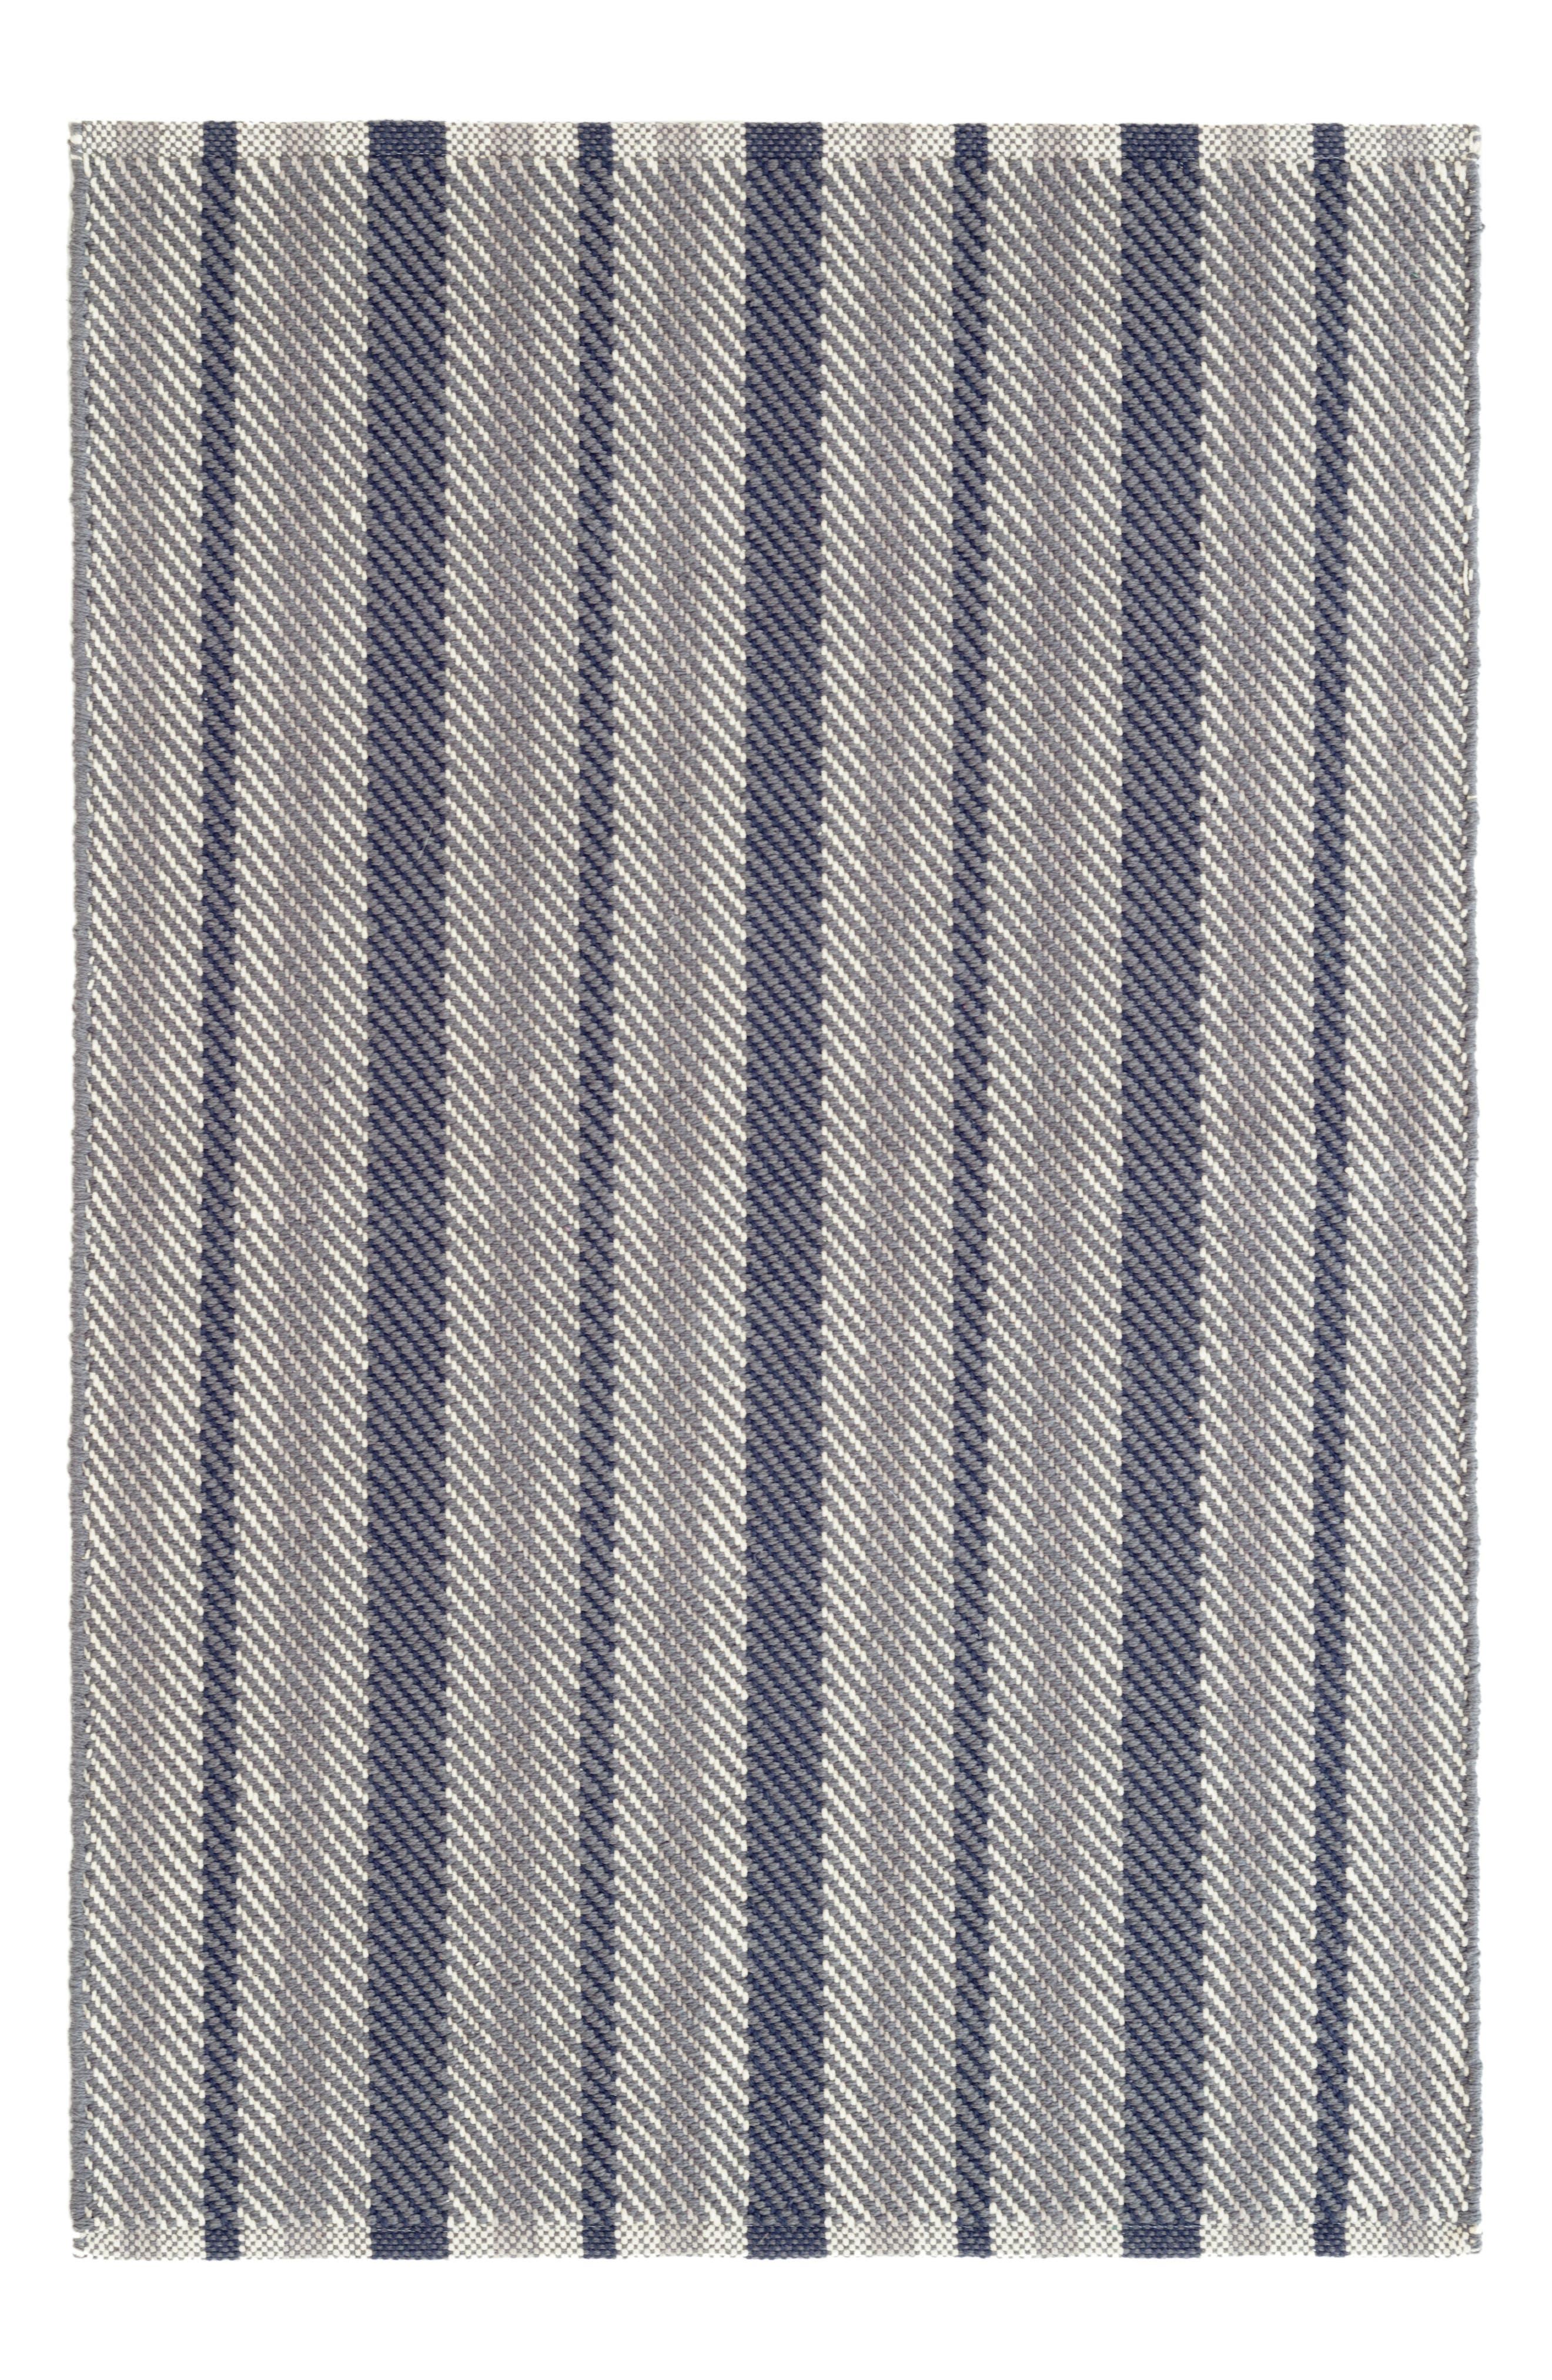 Dash & Albert Herringbone Stripe Woven Rug